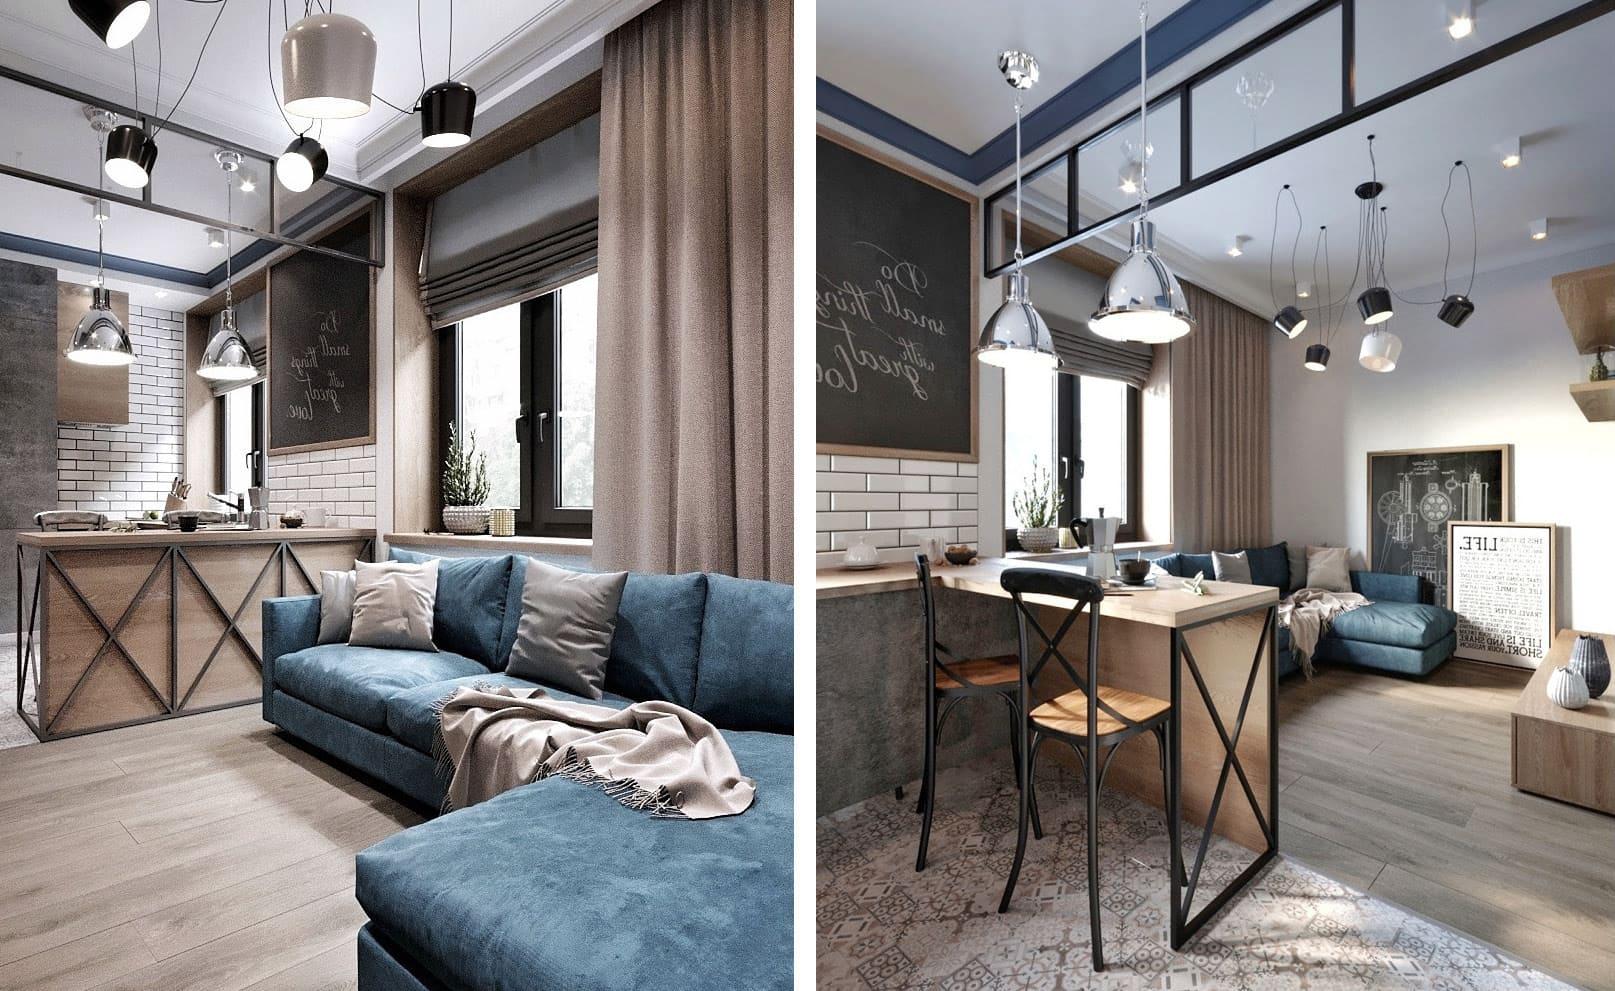 дизайн однокомнатной квартиры фото 37